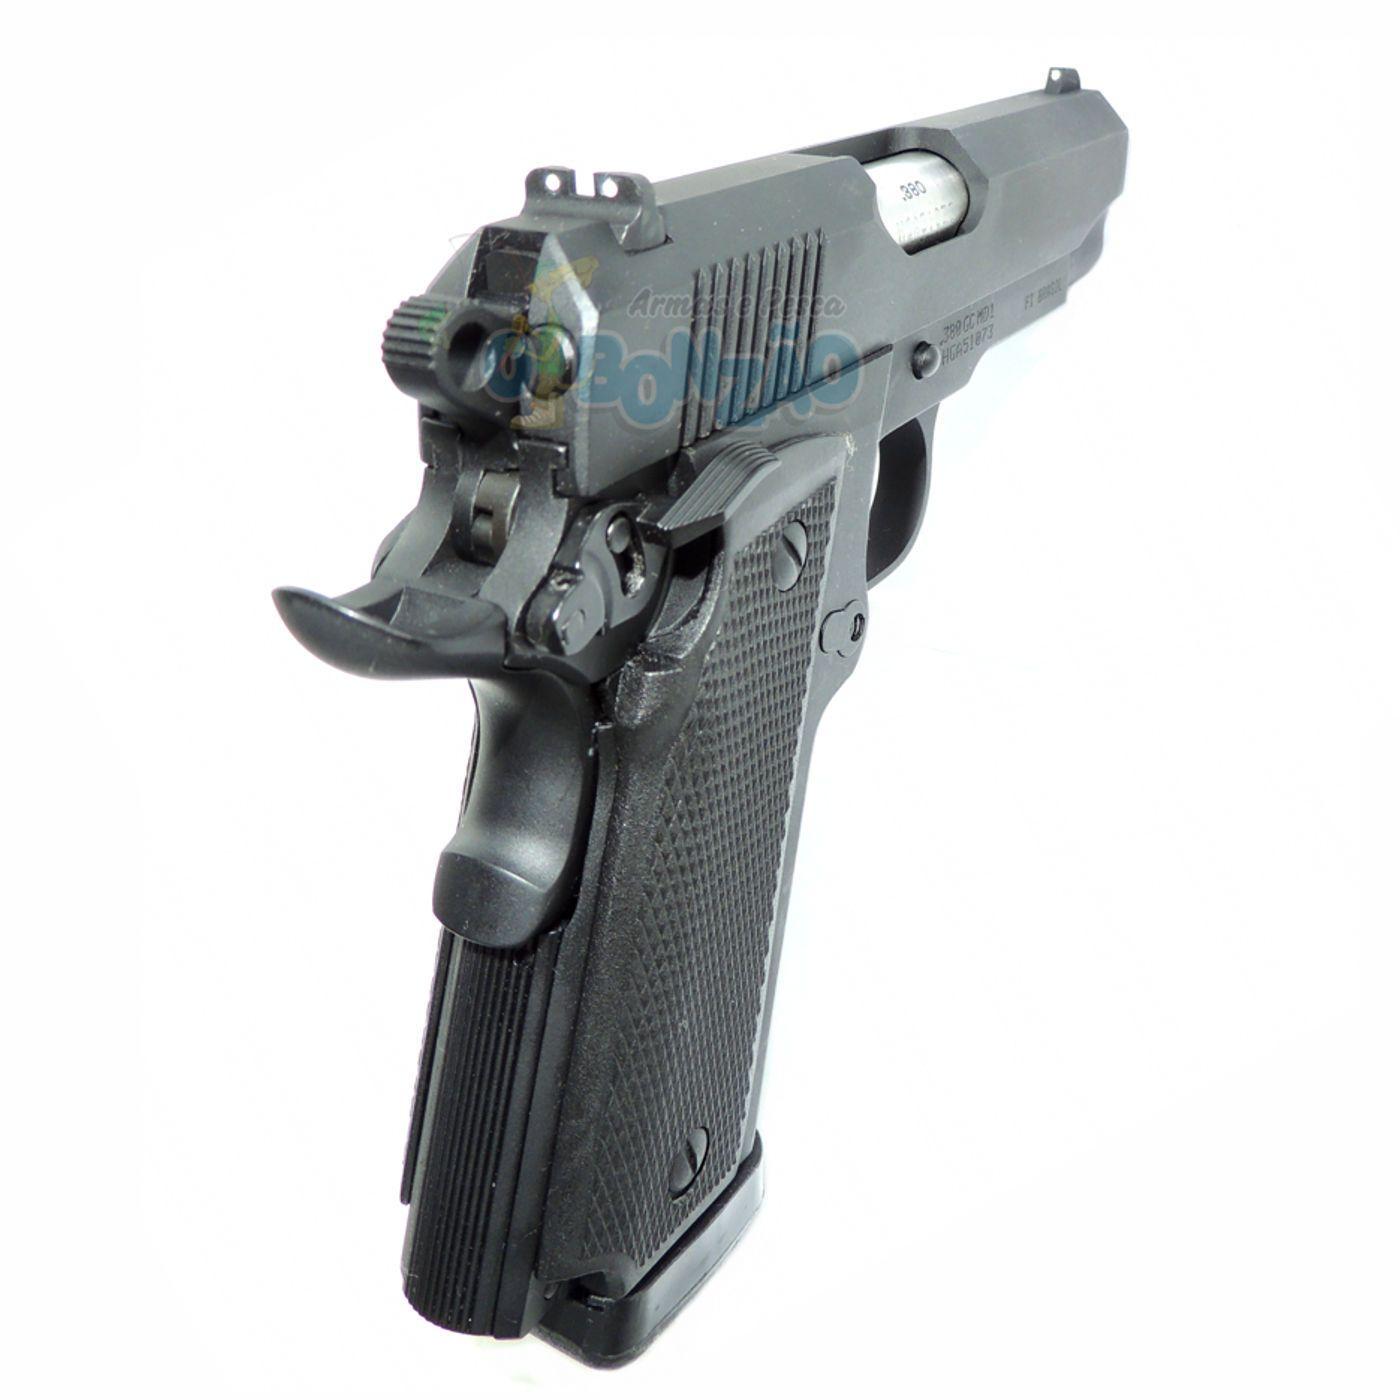 Pistola Imbel MD1 GC Cal .380 ACP 19+1 Tiros Oxidada Preta